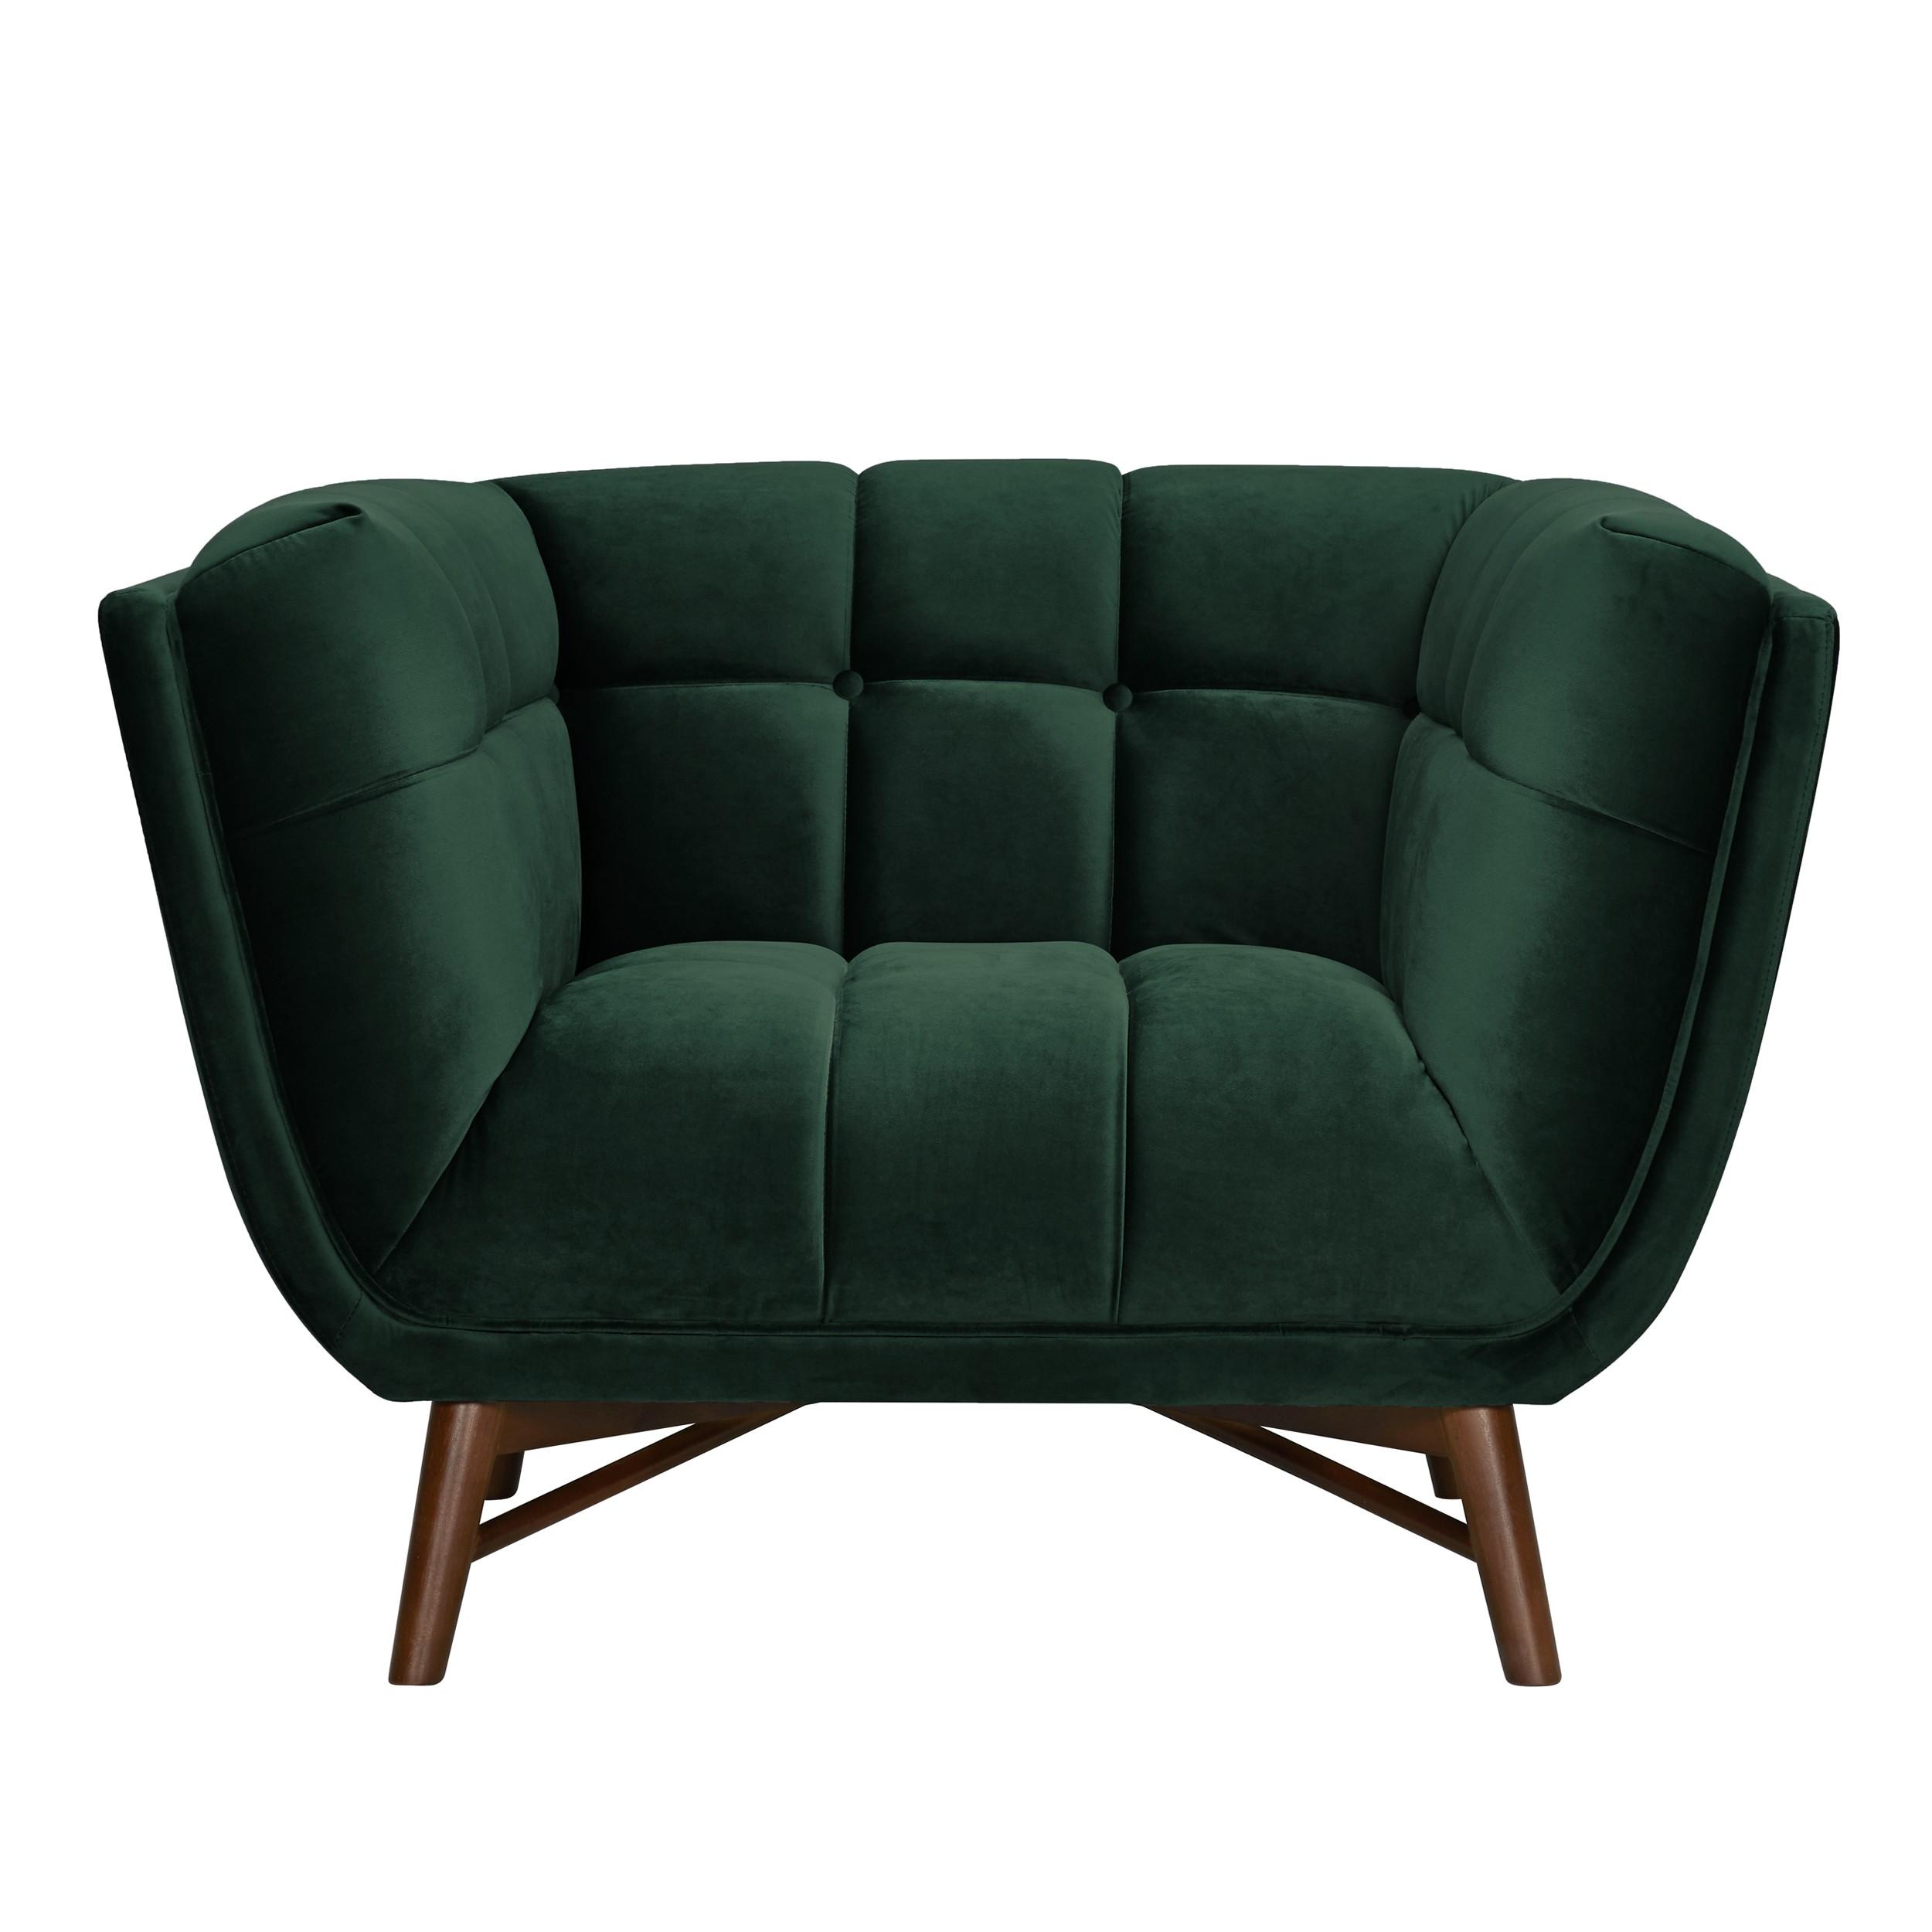 acheter fauteuil vert fonce en velours